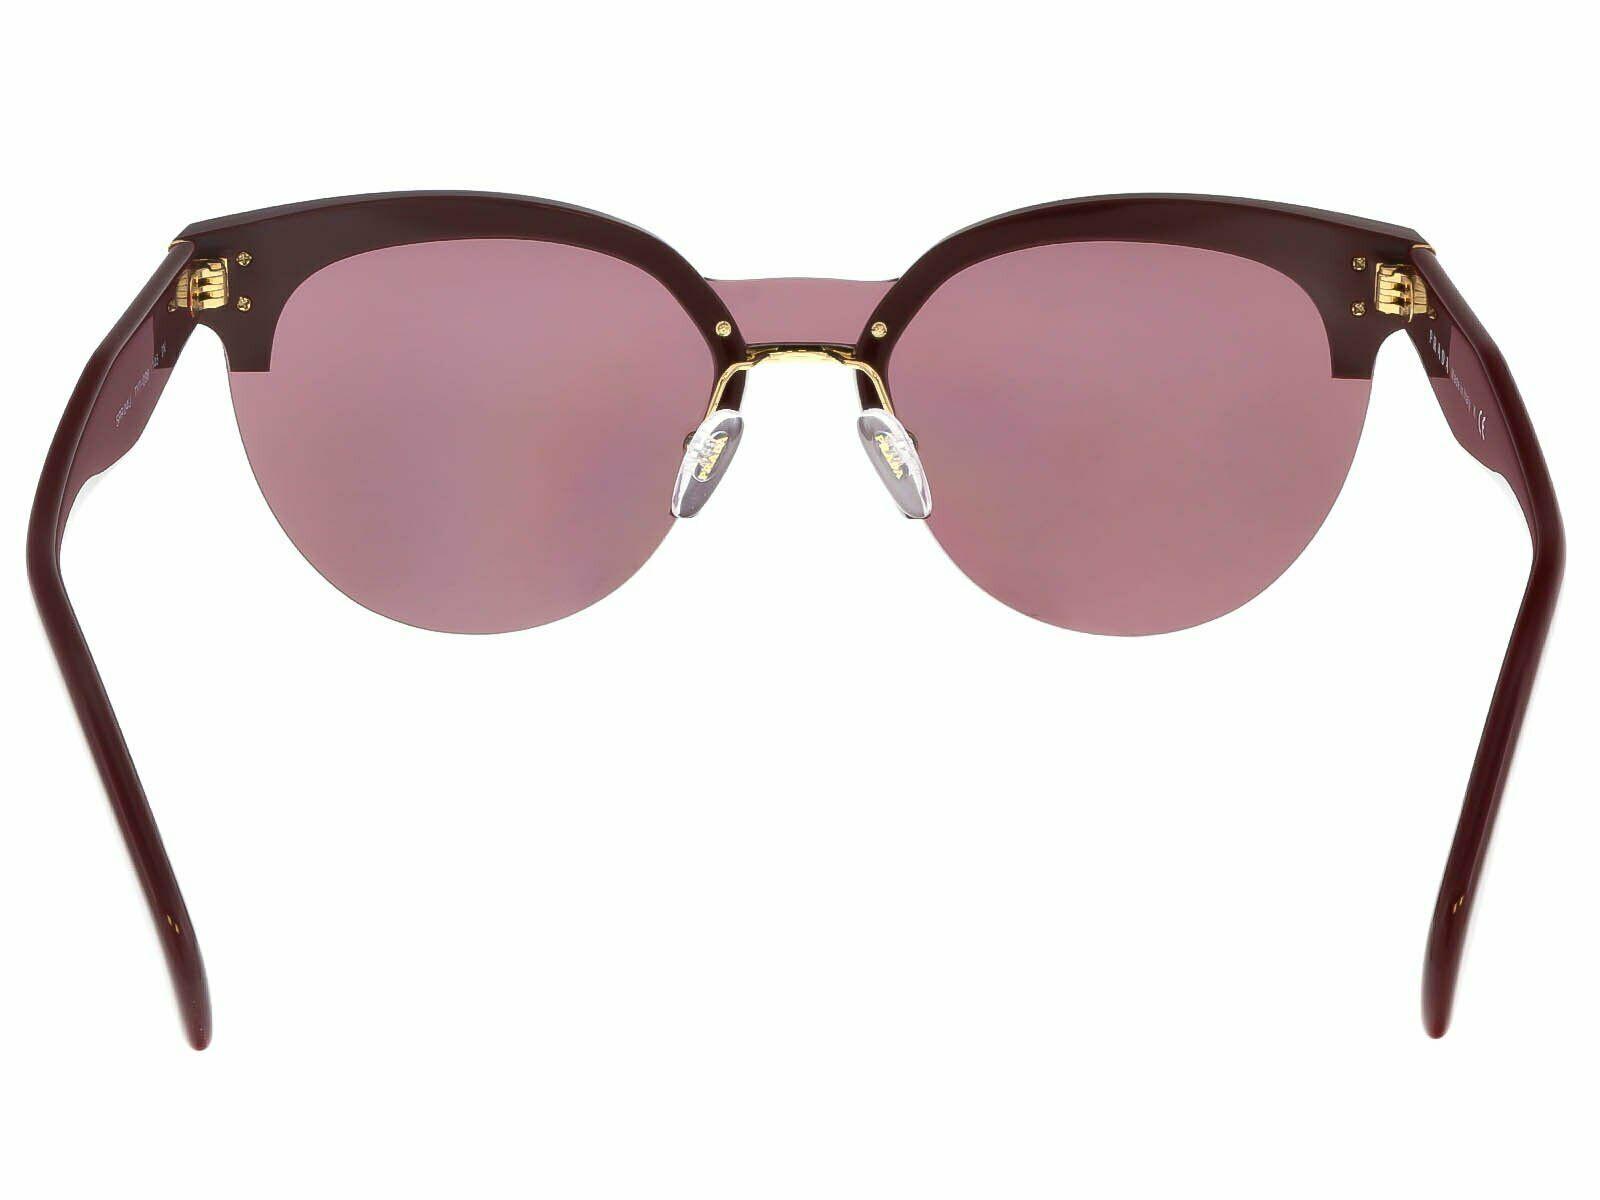 NEW PRADA Cat Eye Women's Sunglasses PR 04US TY7098 Bordeaux Gold